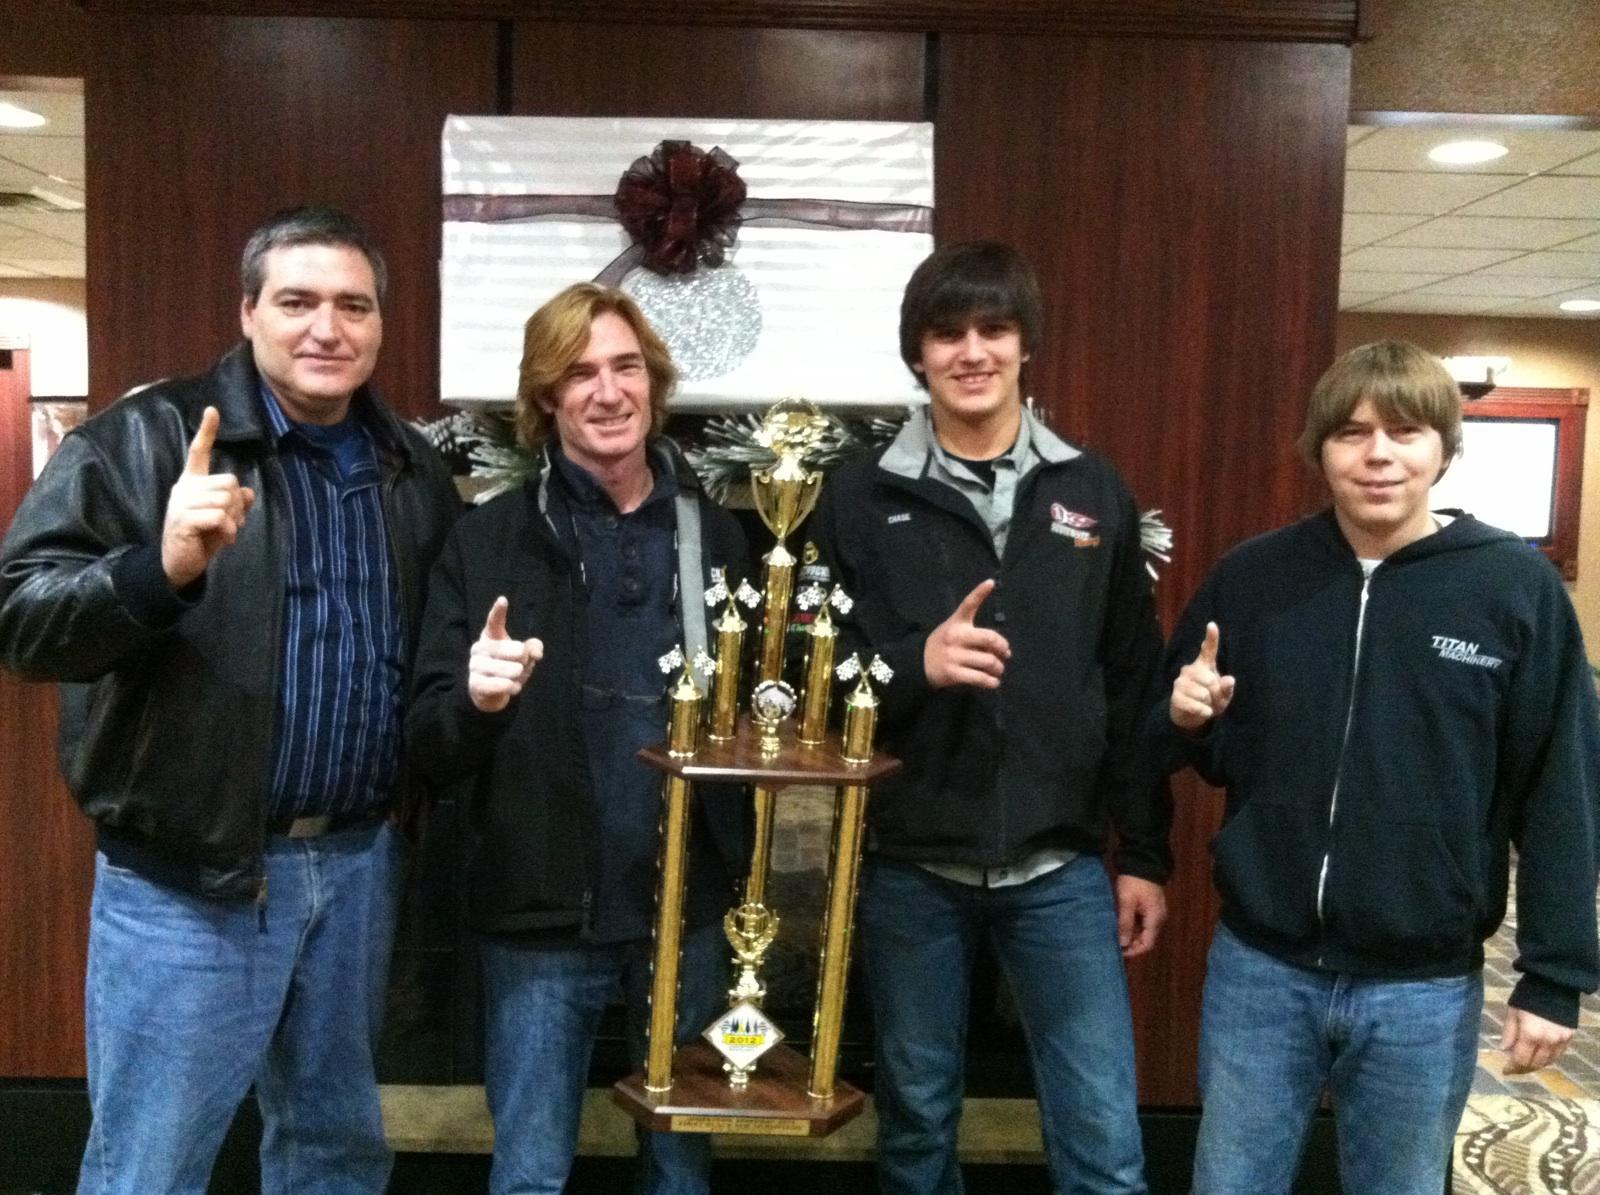 Jamestown Speedway Track Champions.  The SBR Crew: John, Scott, Chase & Joey